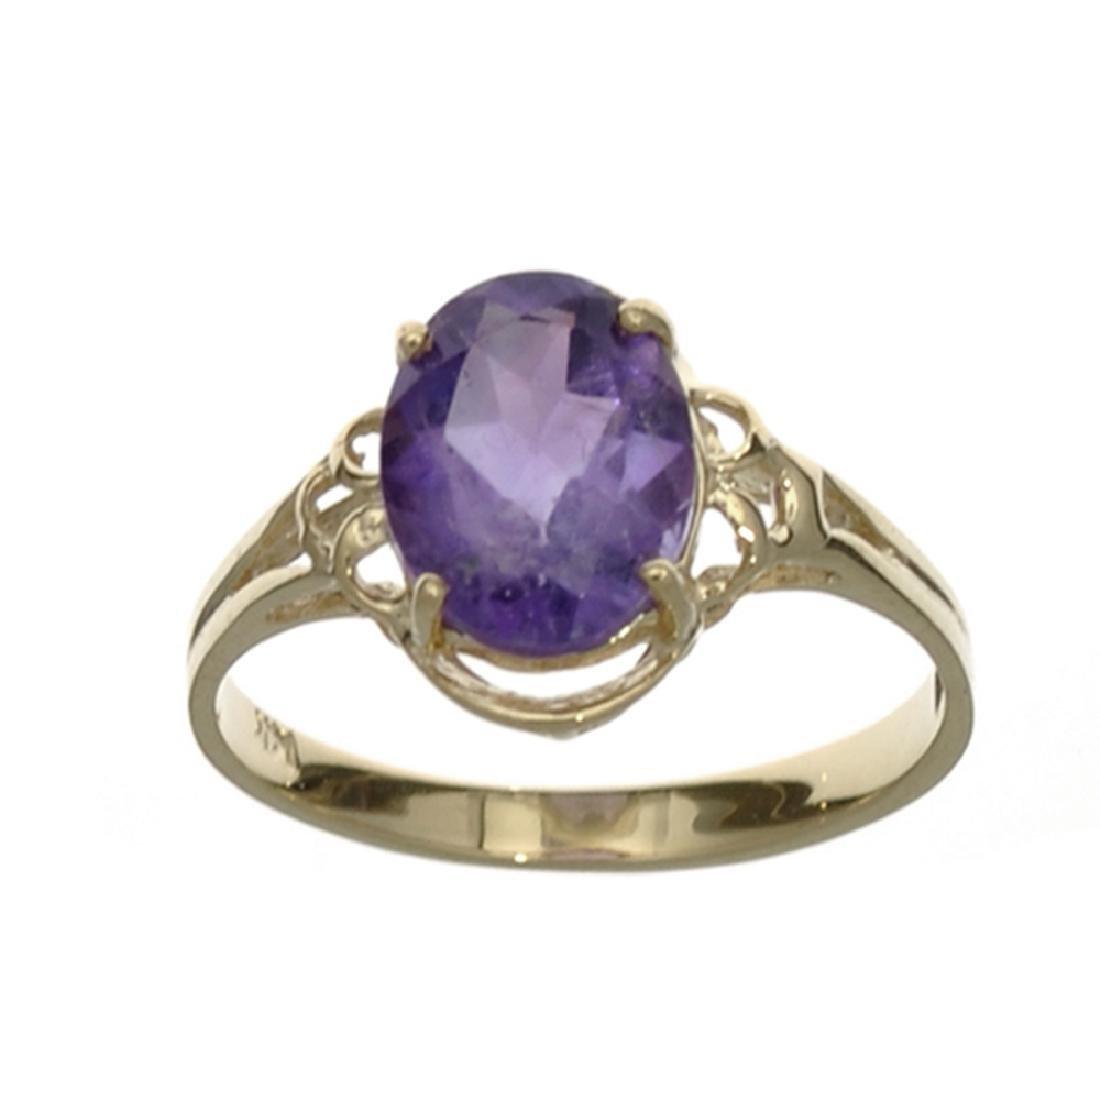 APP: 0.6k Fine Jewelry 14 KT Gold, 1.76CT Oval Cut